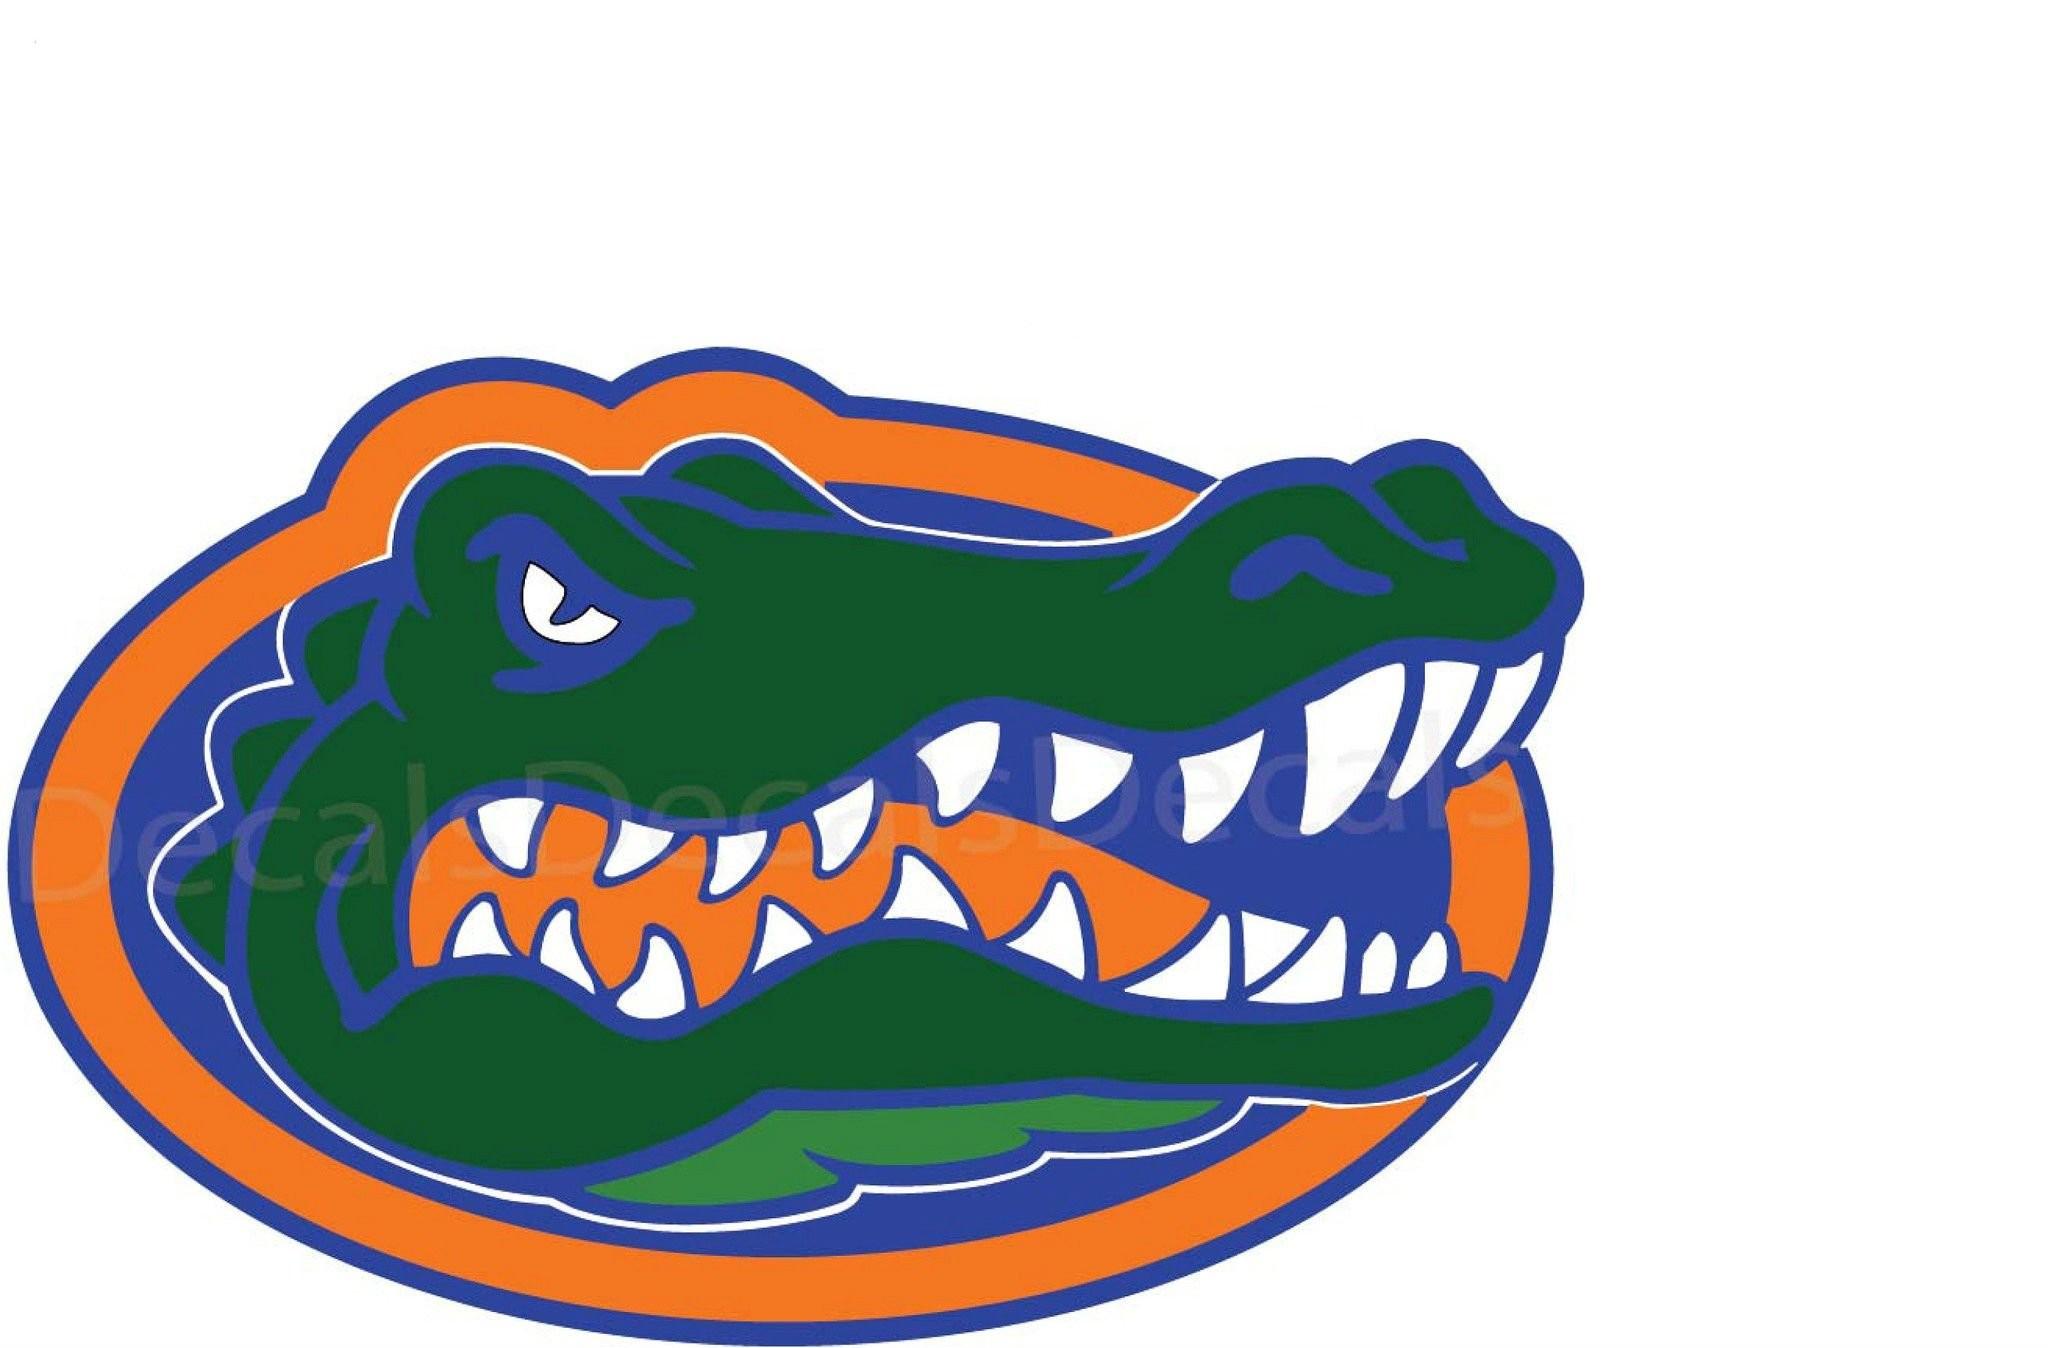 University of Florida Football Wallpaper – WallpaperSafari